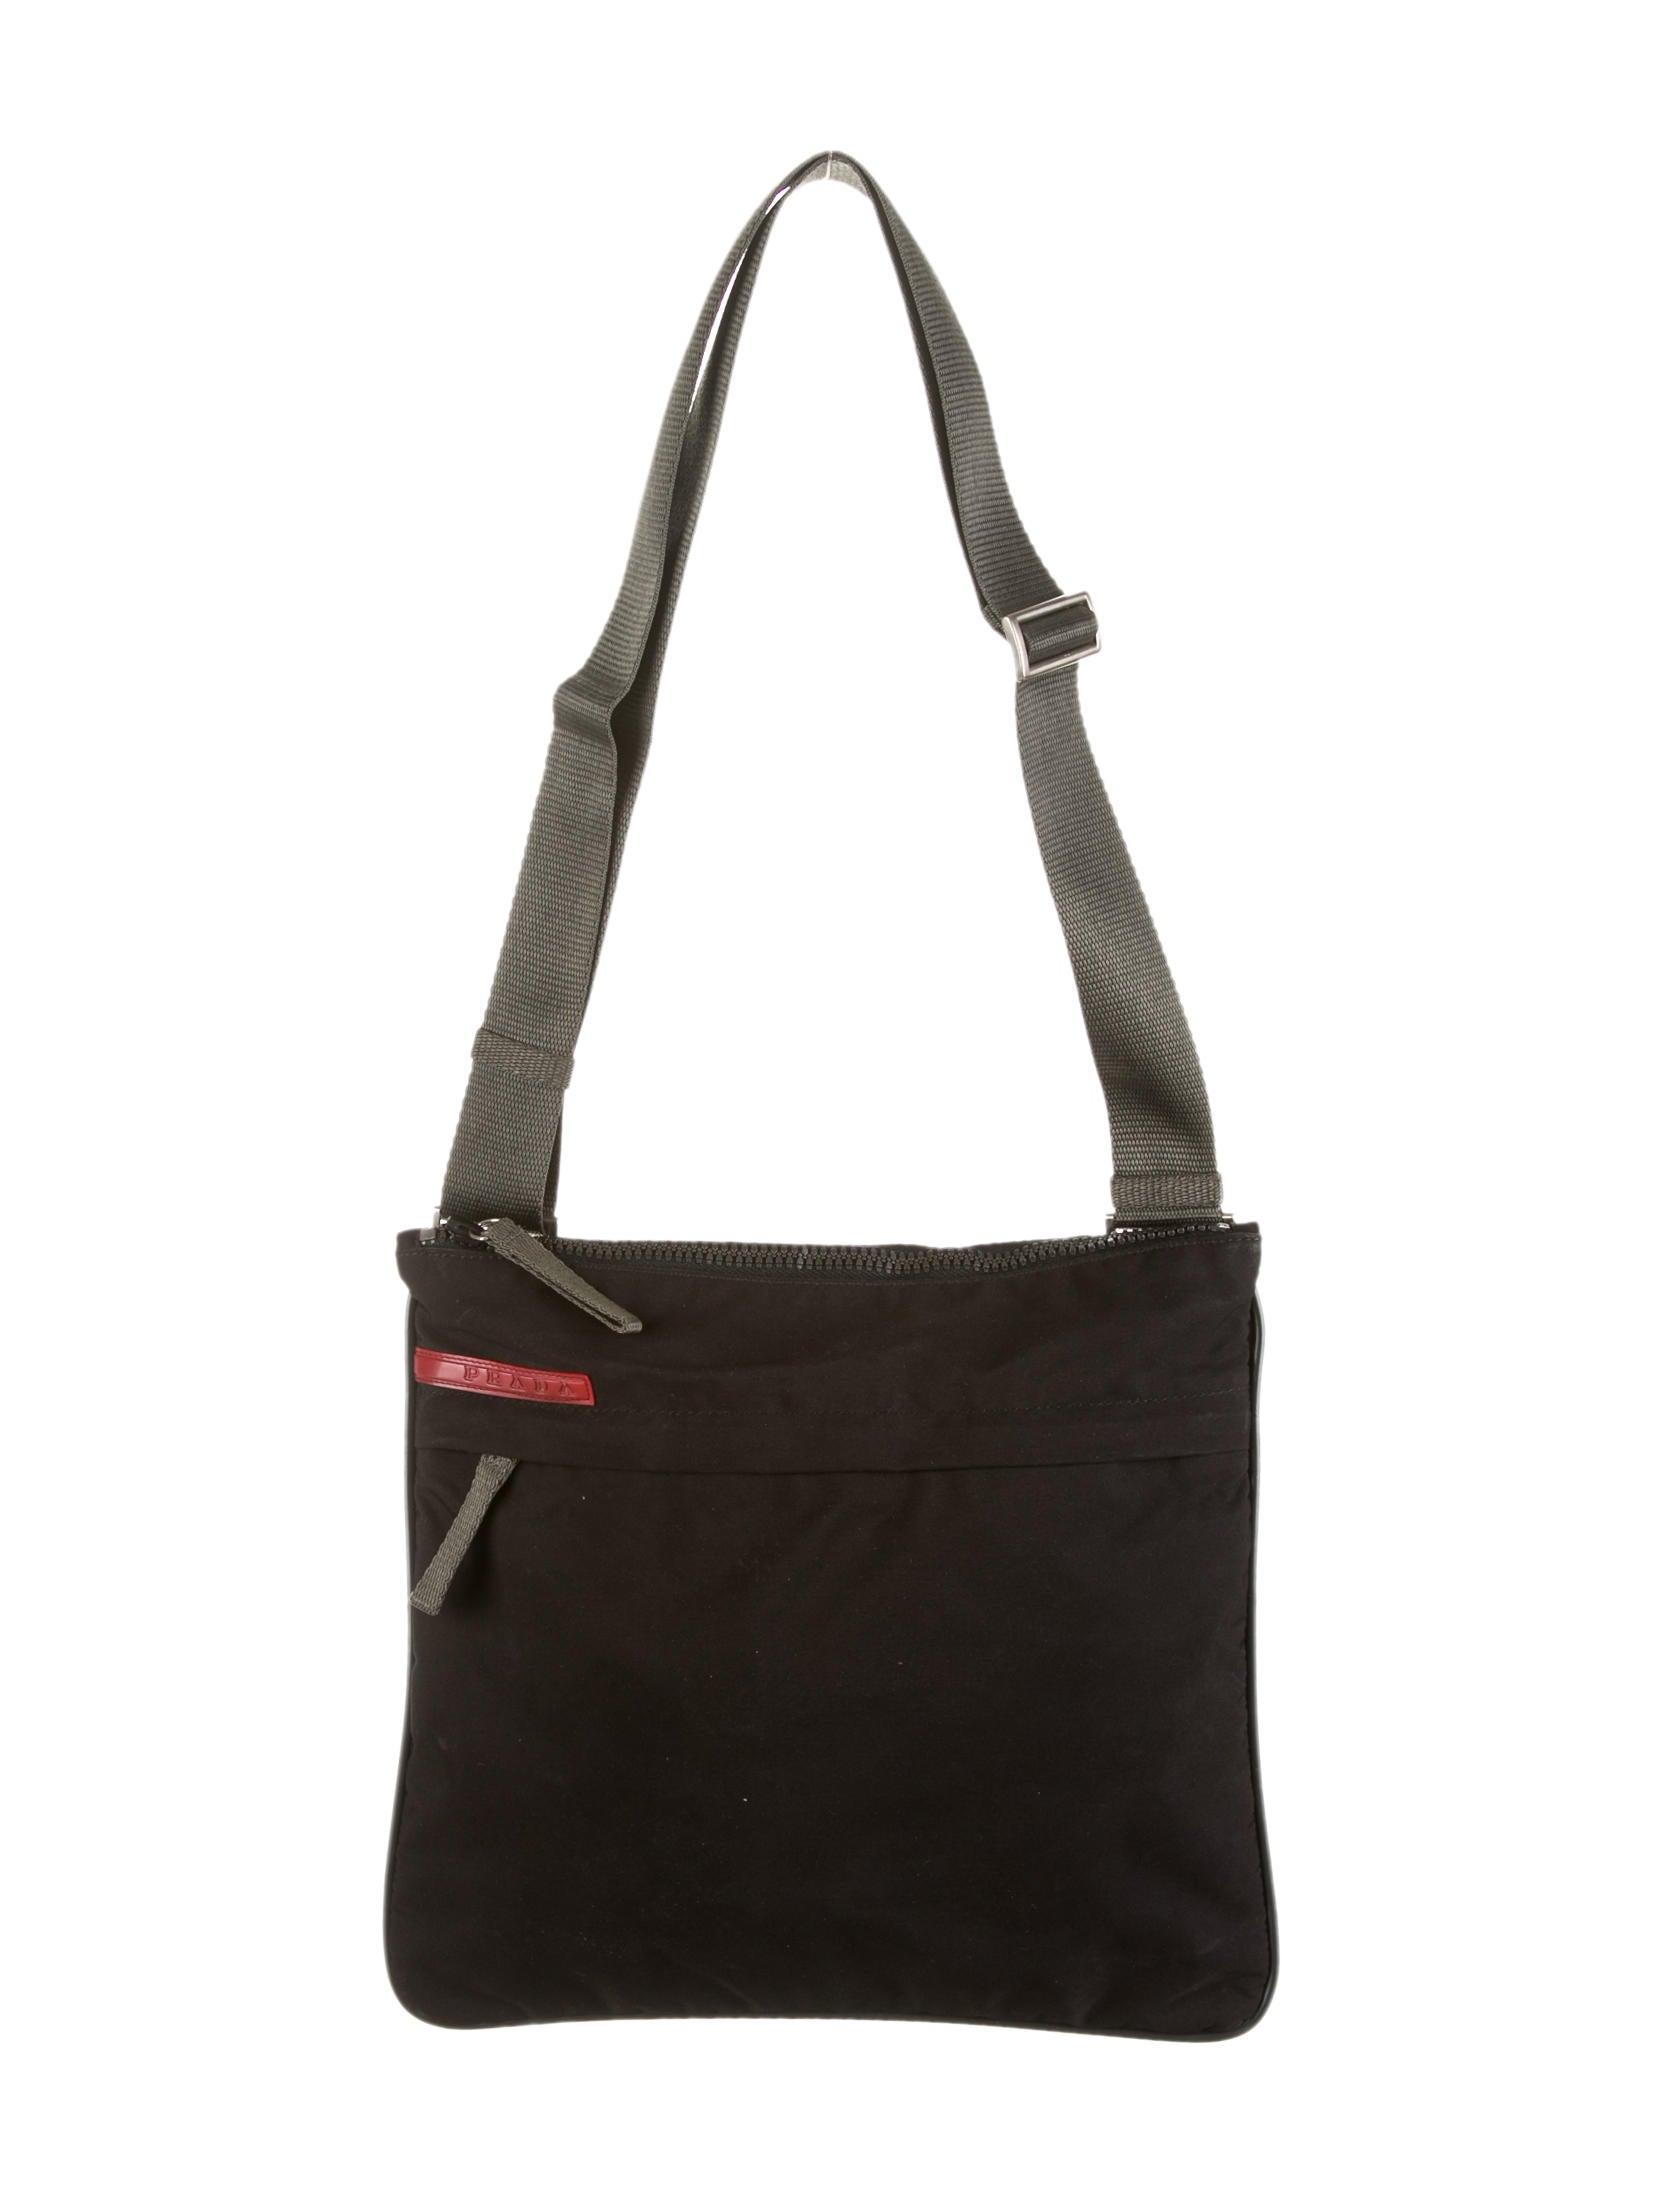 prada leather goods - Prada Sport Messenger Bag - Mens Bags - WPR25725 | The RealReal